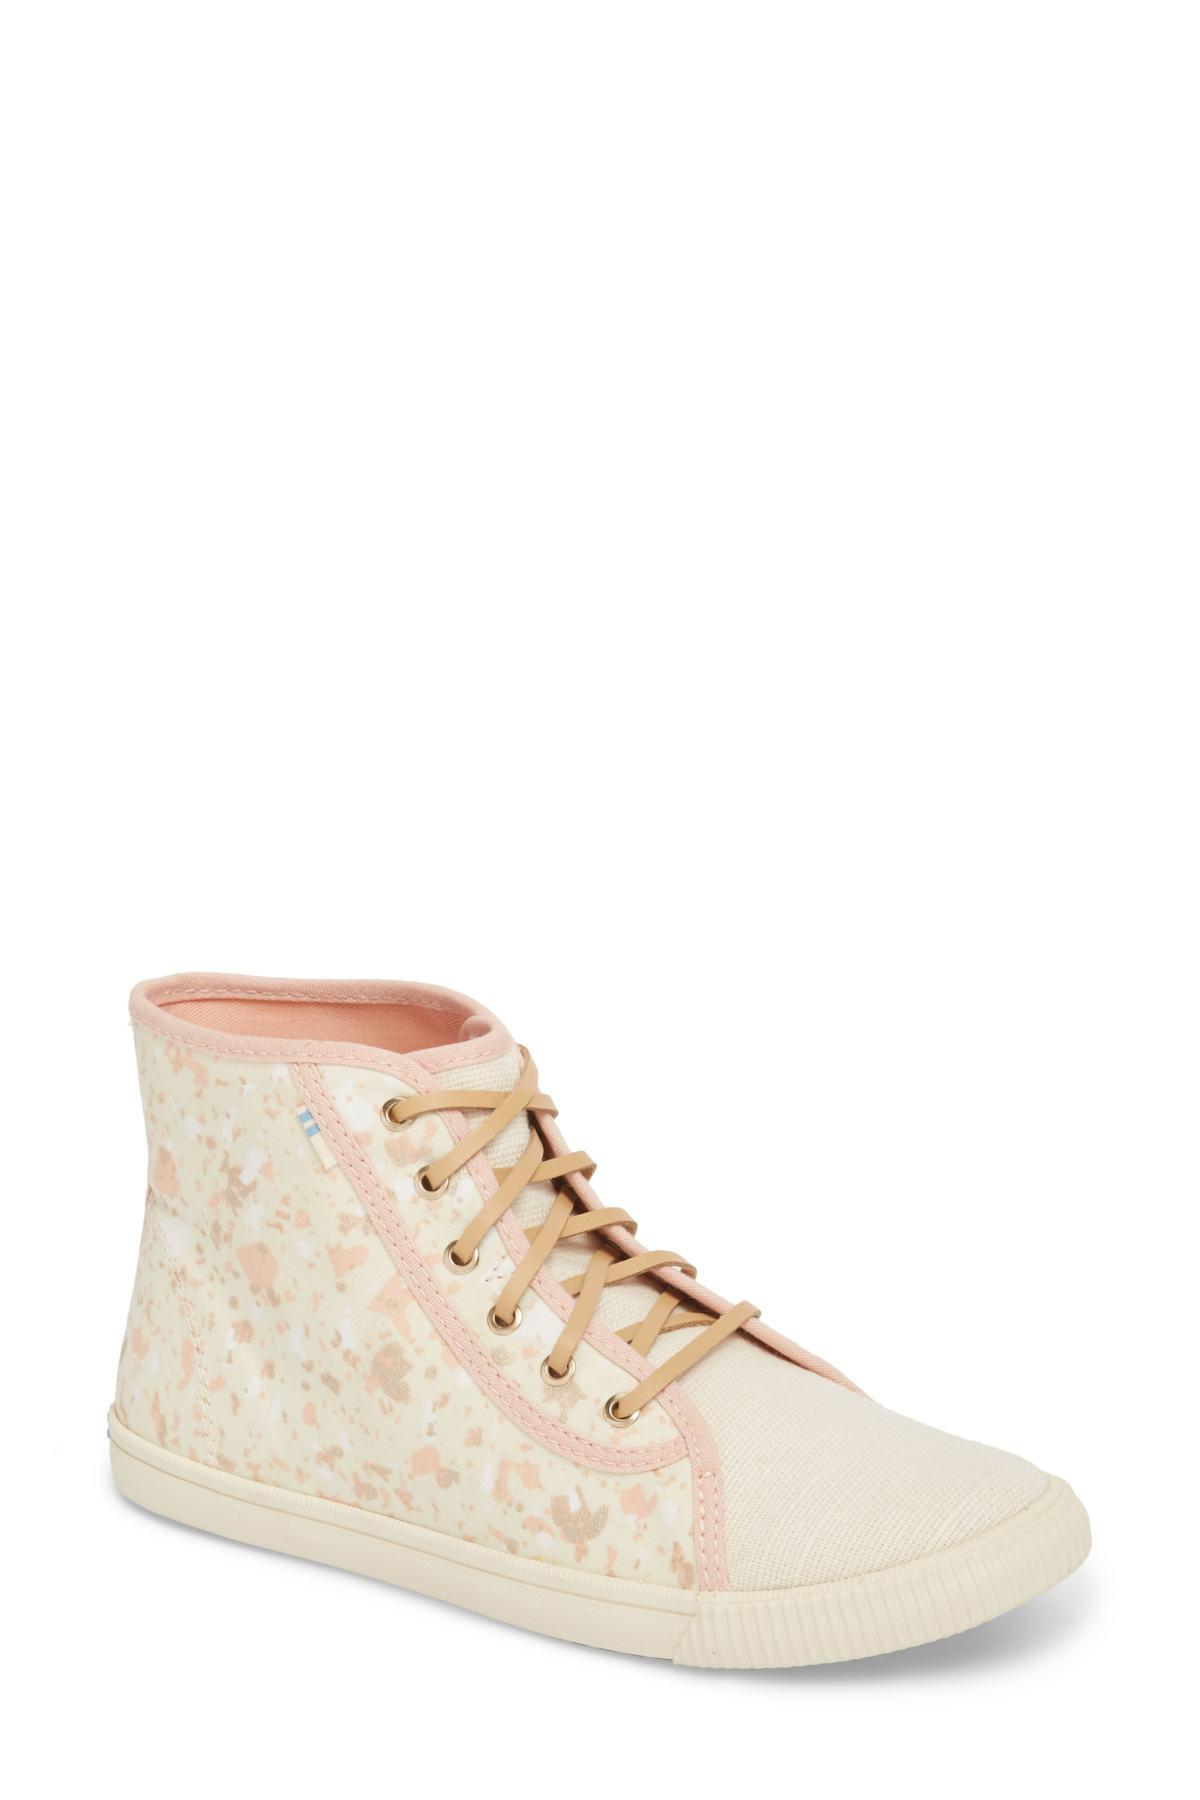 TOMS Camarillo High Top Sneaker (women